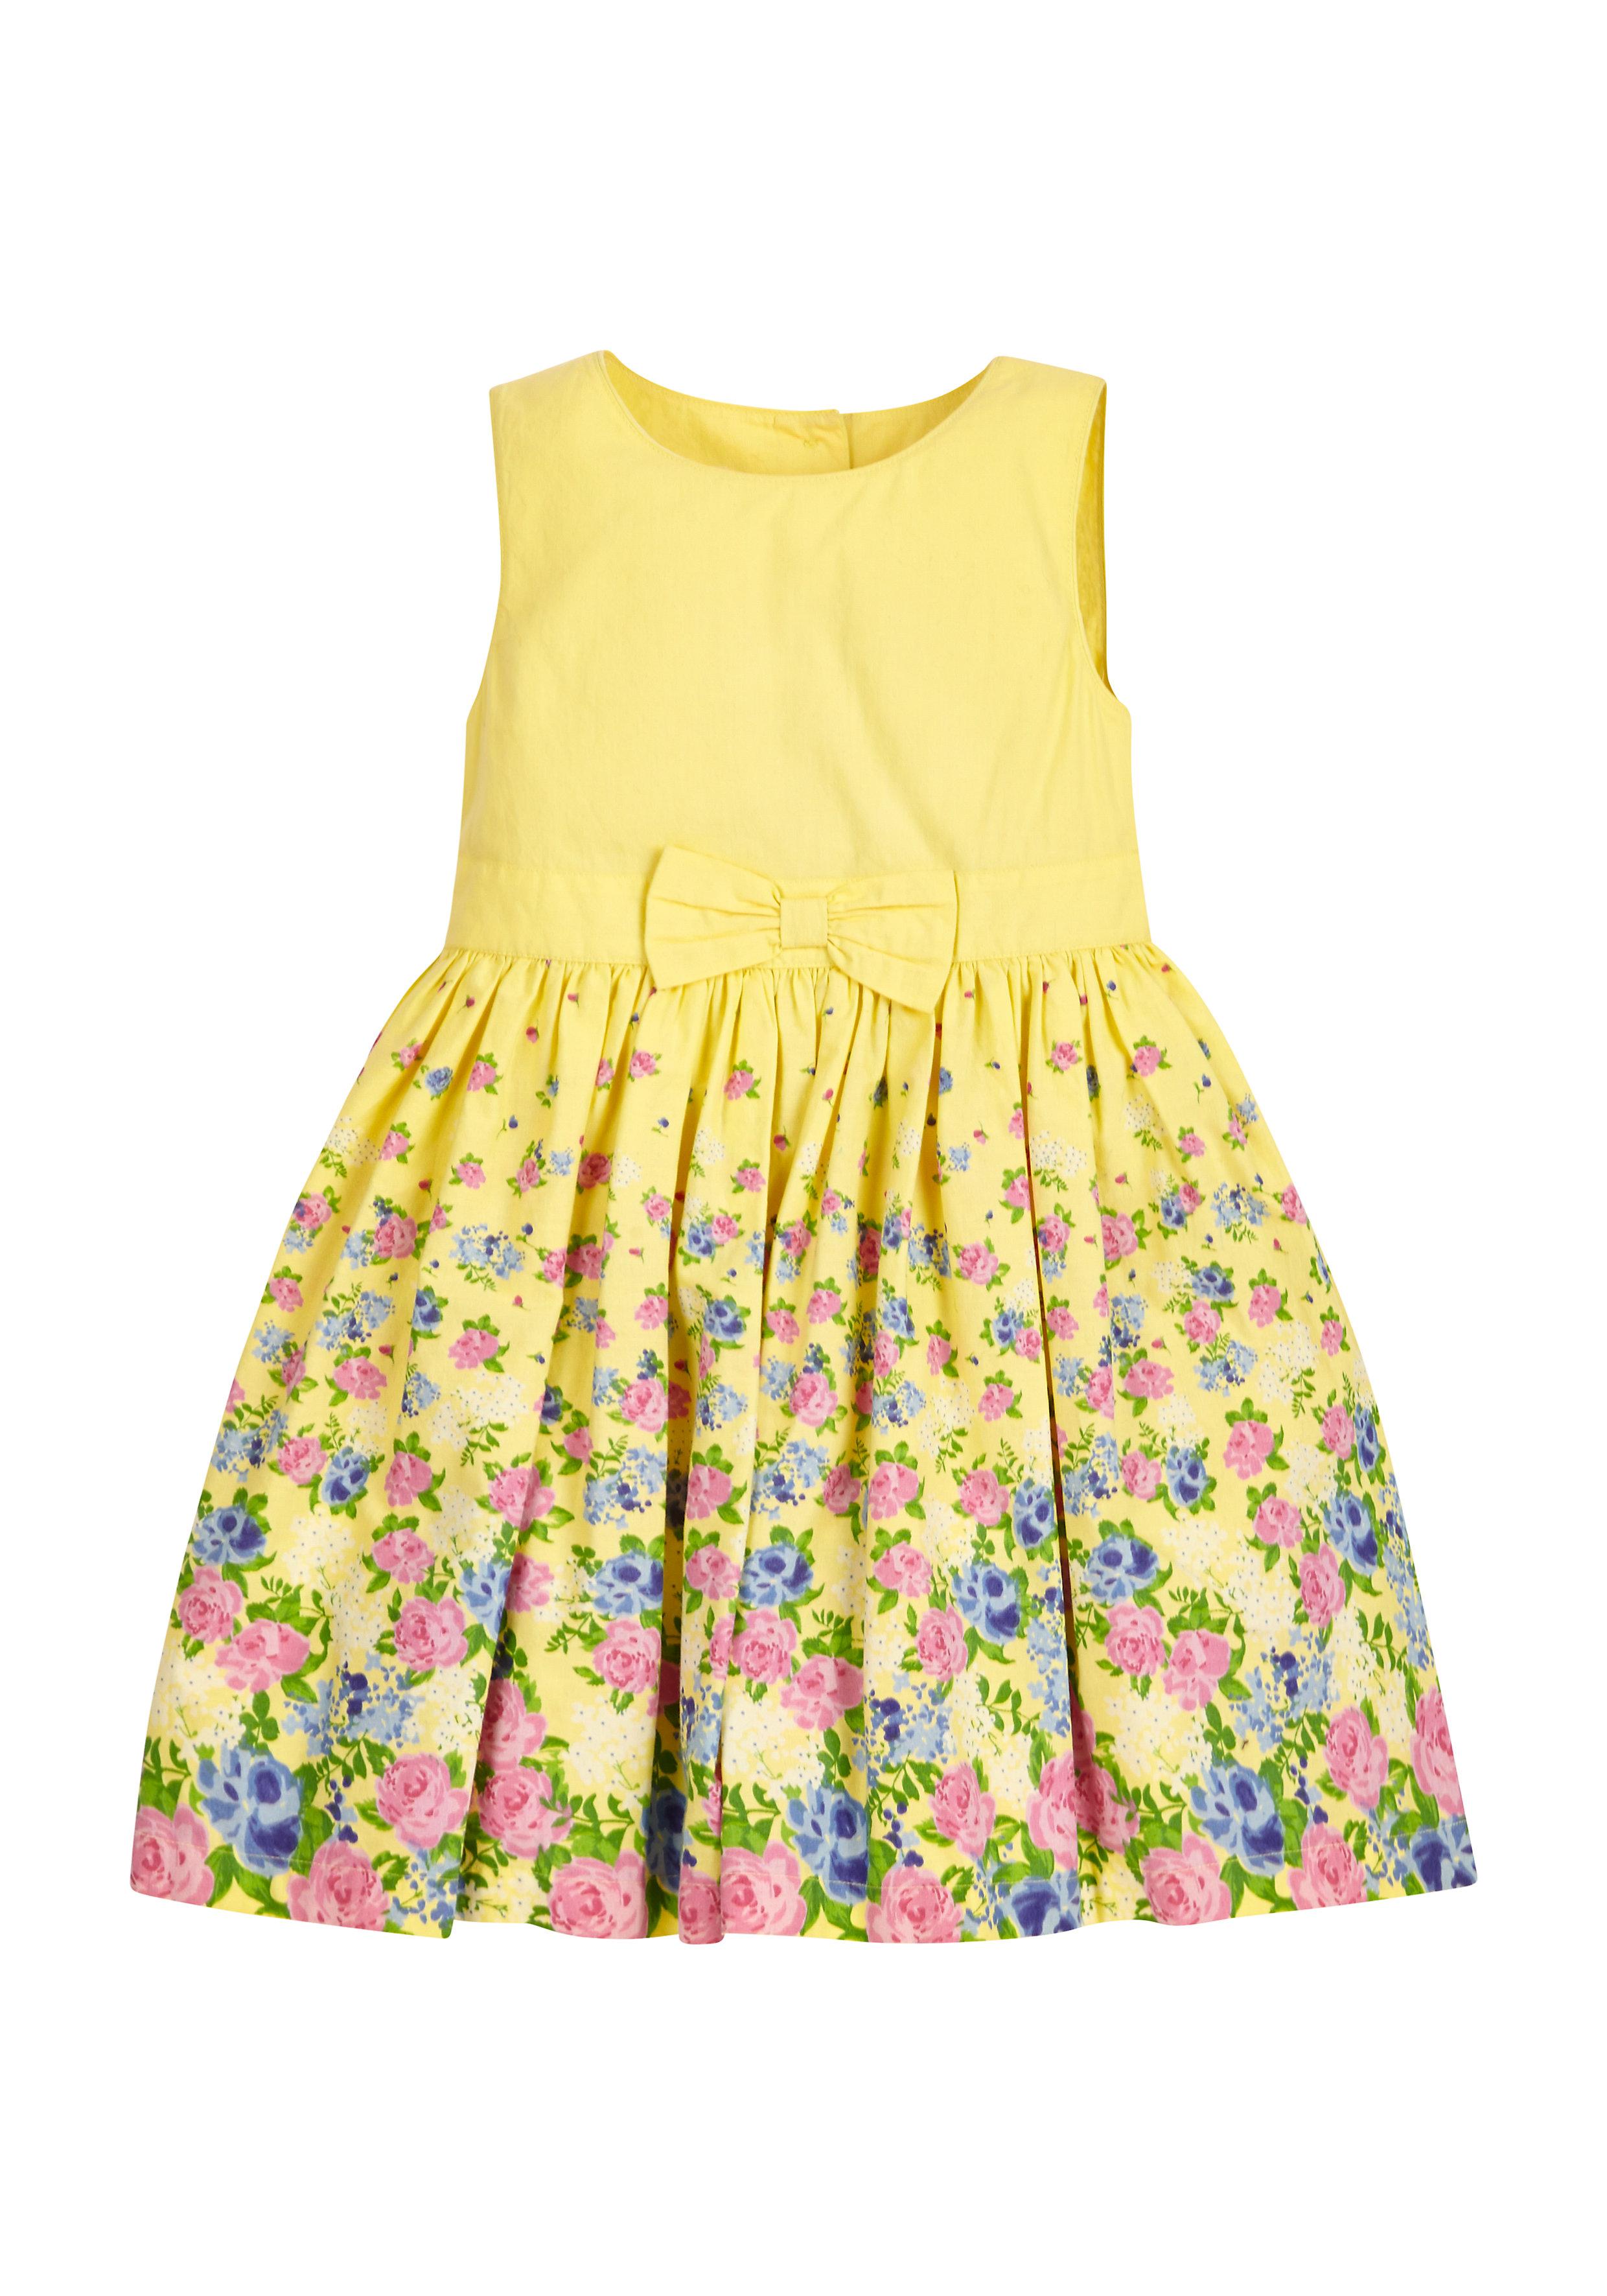 Mothercare | Girls Lemon Floral Dress - Yellow